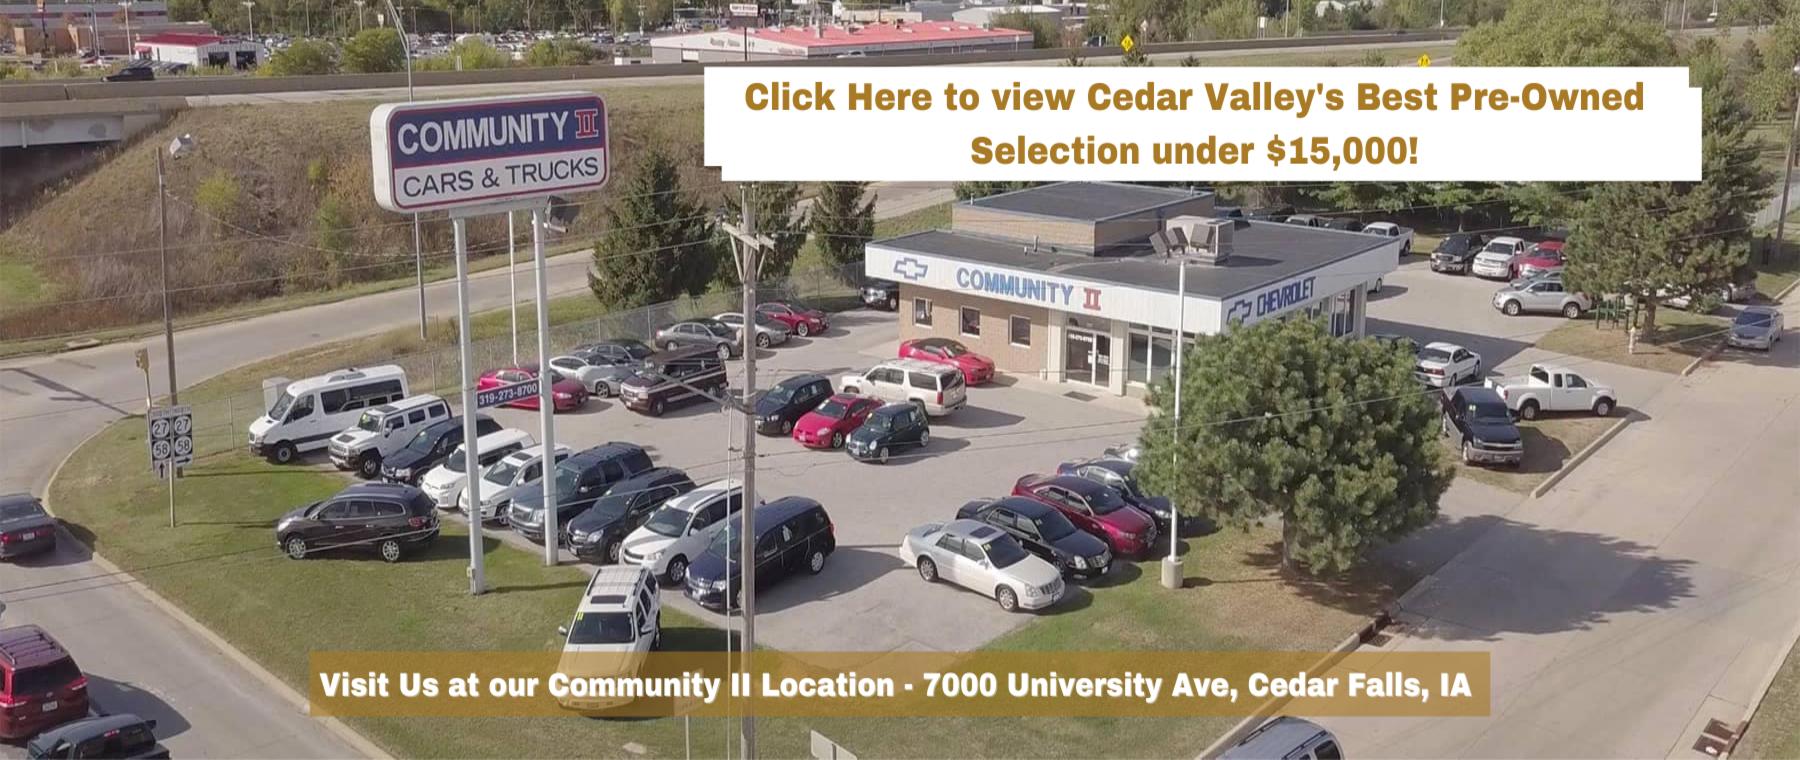 Visit_Us_at_our_Community_II_Location_7000_University_Ave_Cedar_Falls_IA_3_1800x760